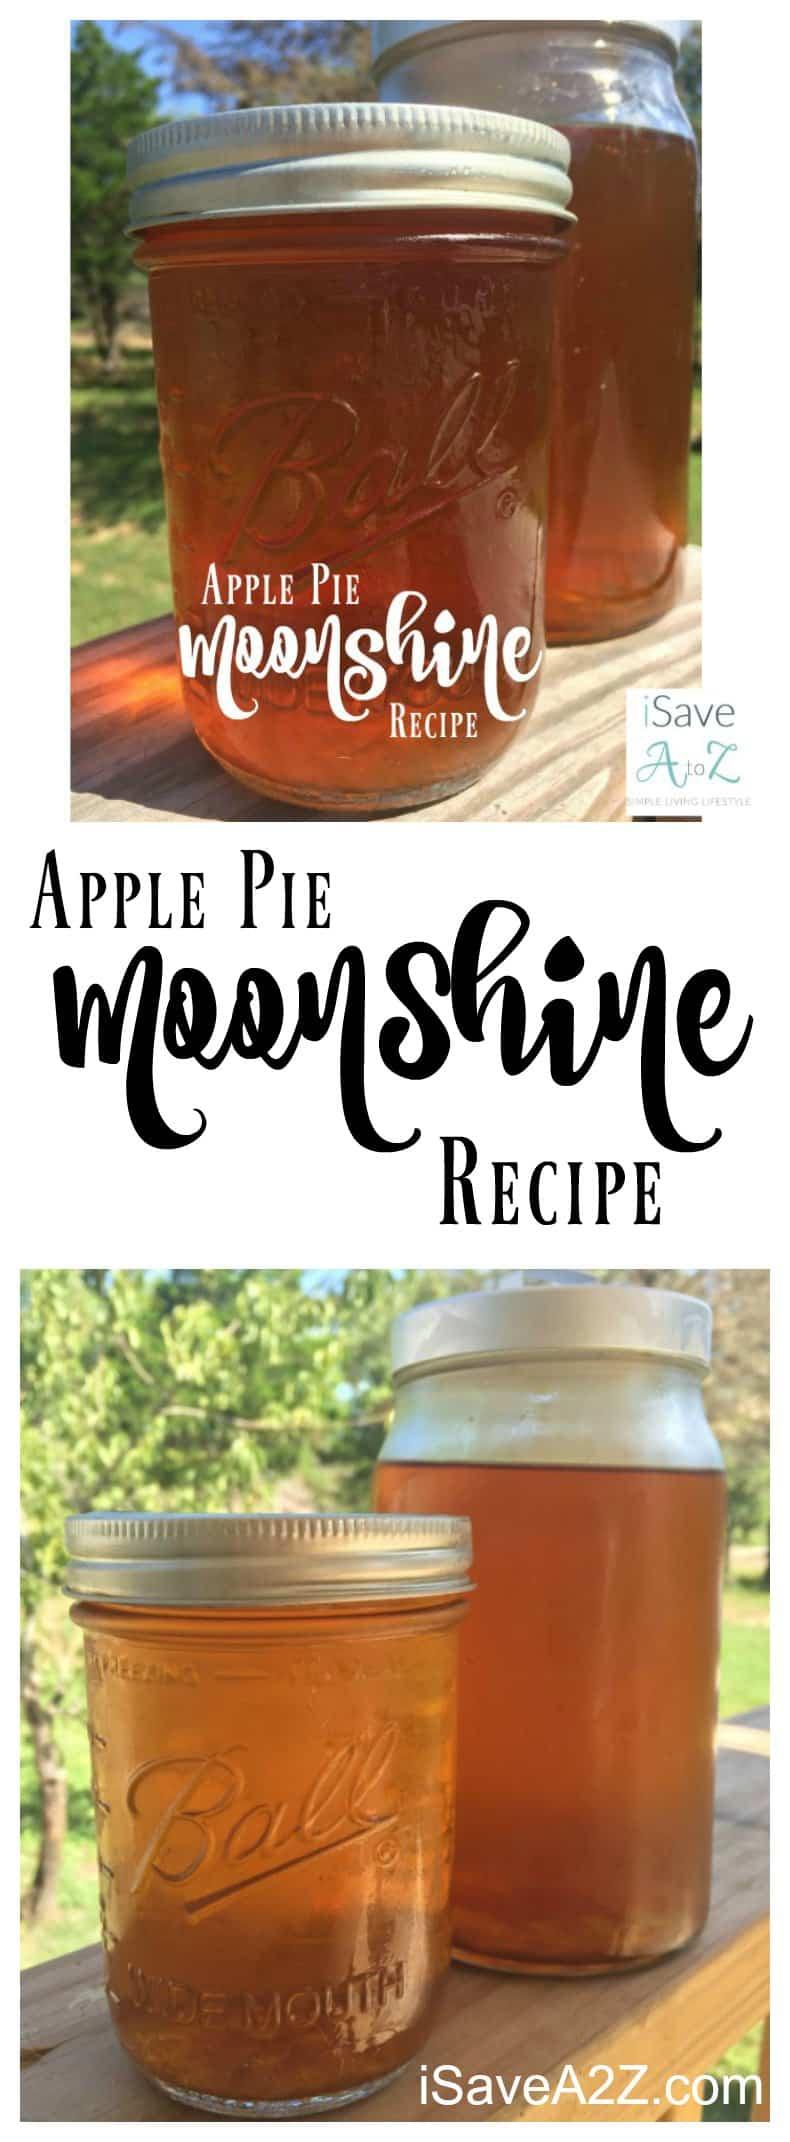 Apple Pie Moonshine Recipe - iSaveA2Z.com